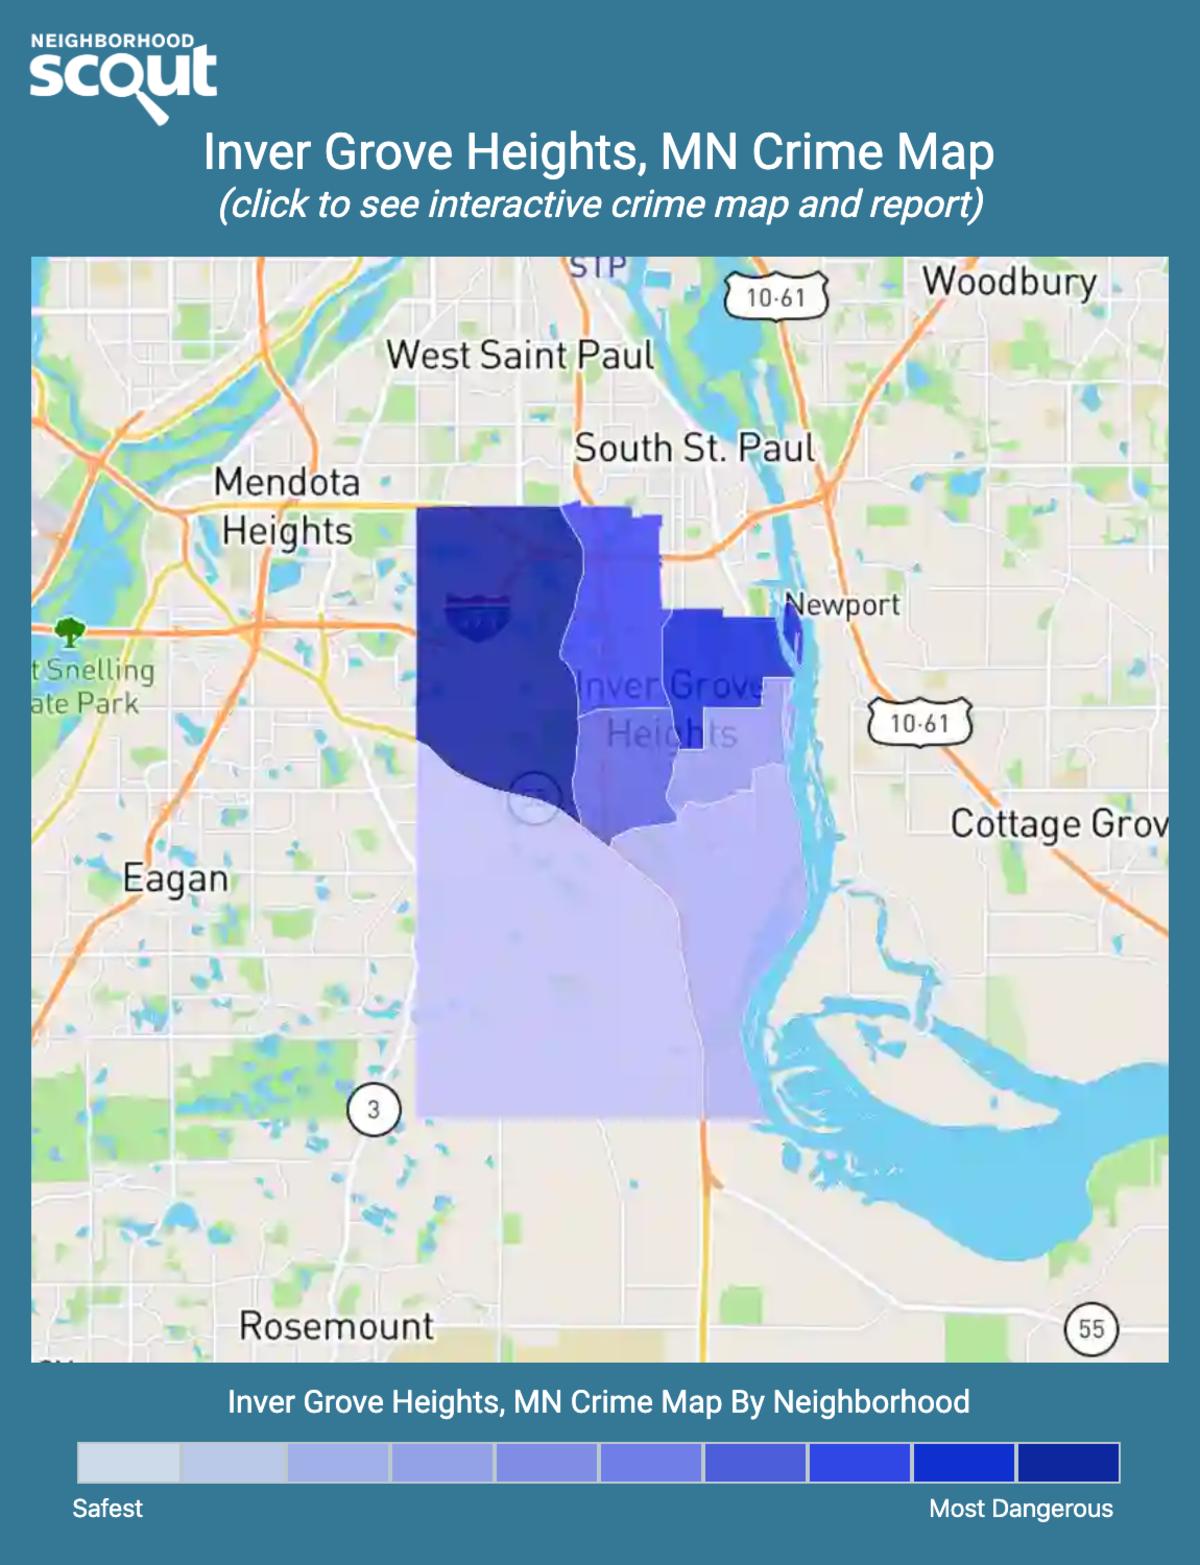 Inver Grove Heights, Minnesota crime map